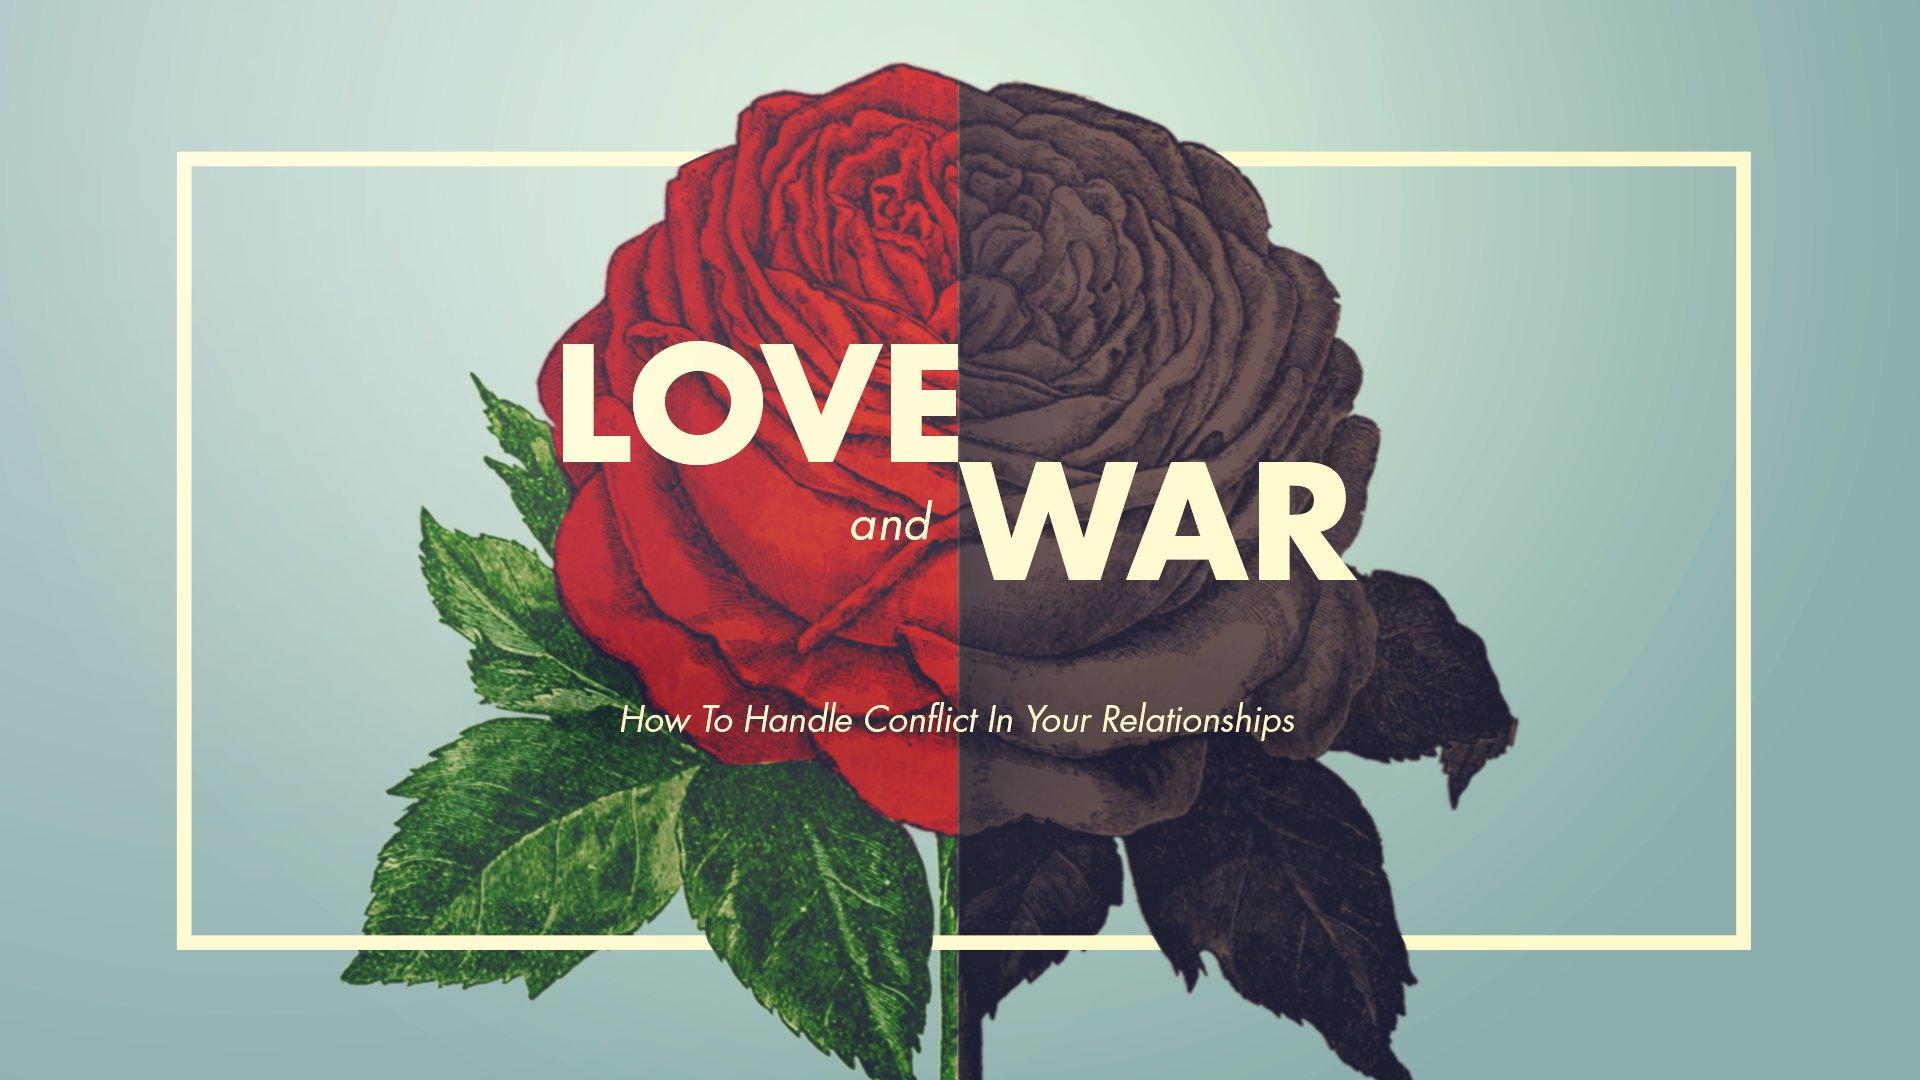 Love-and-War_Jim-LePage.jpg